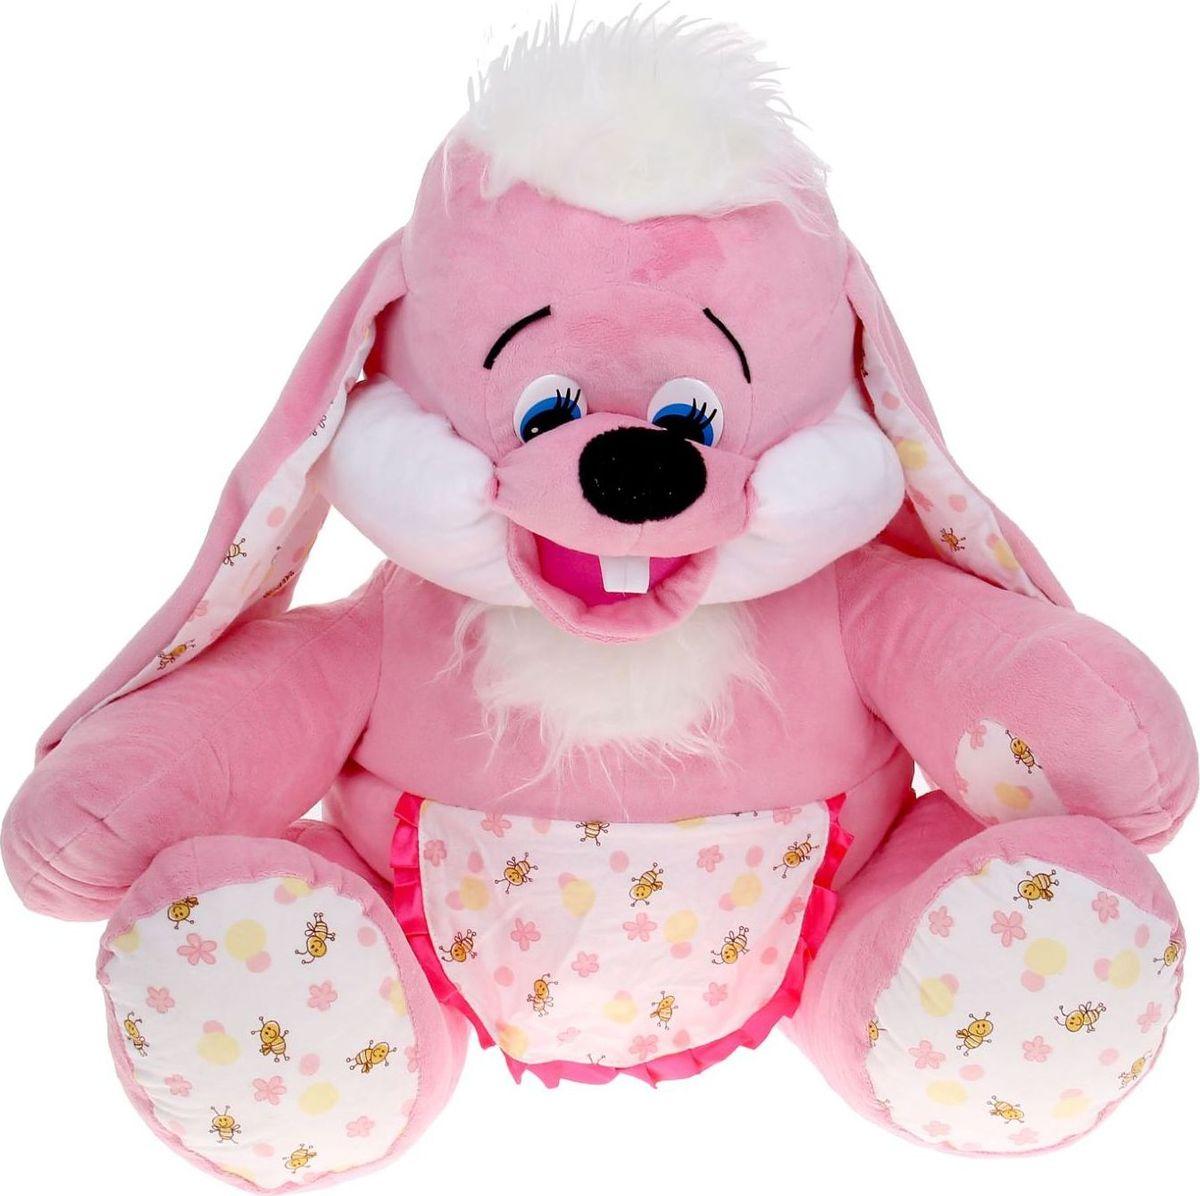 Флиппер Тойз Мягкая игрушка Зайка-Хозяйка 65 см игрушка флиппер мишка в футболке brown фл602